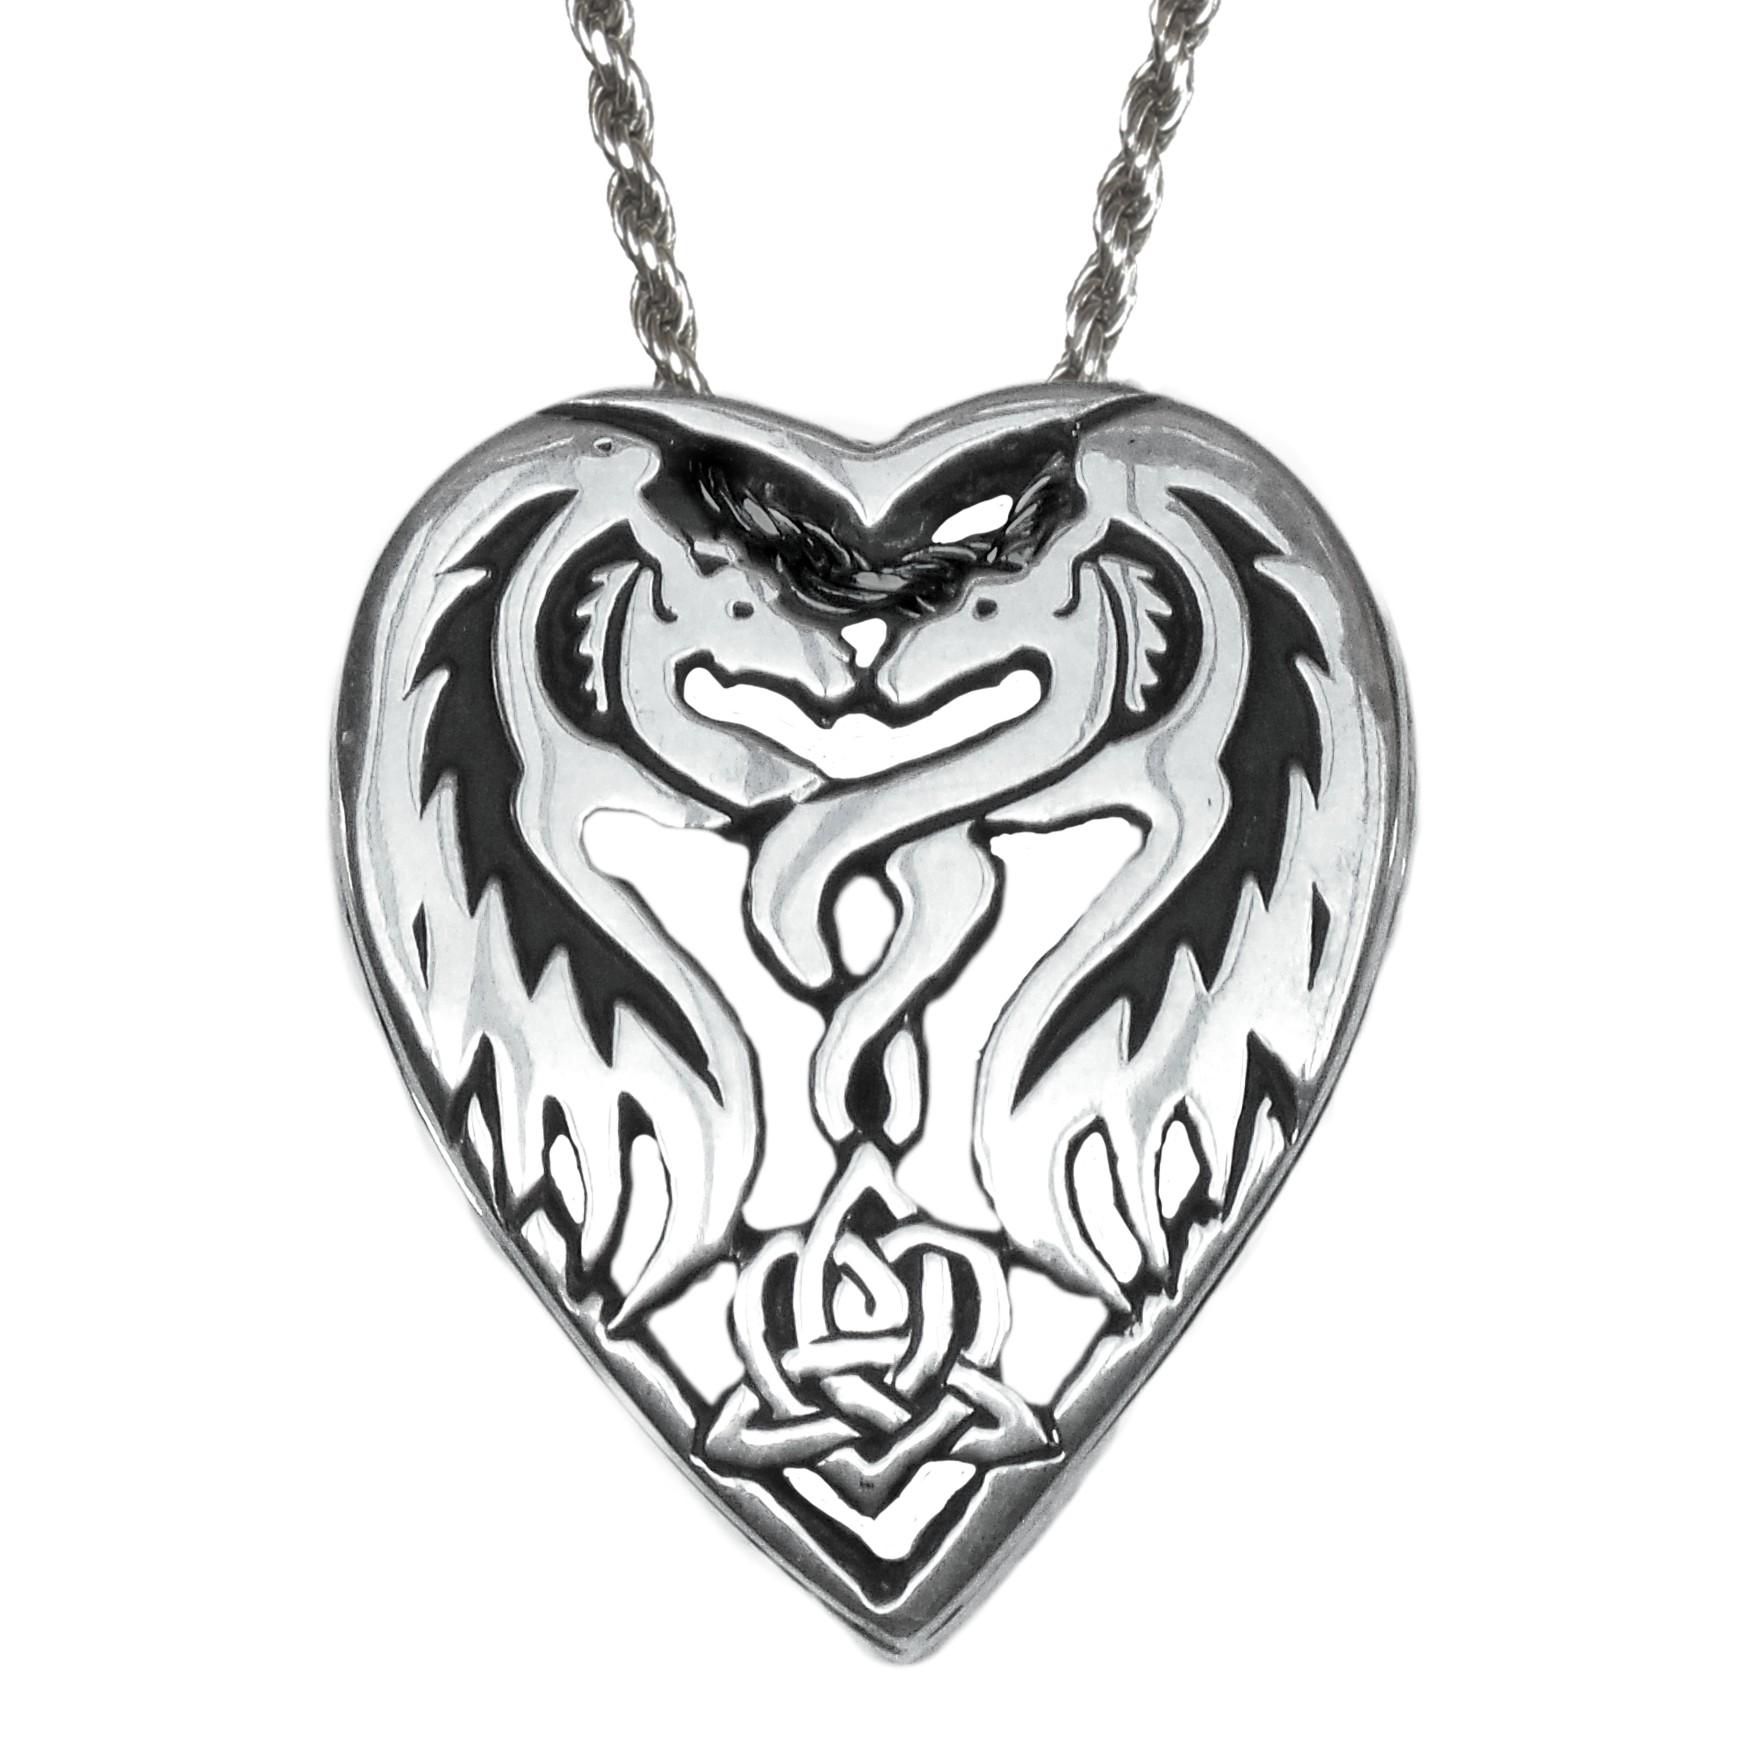 1752x1752 Heart Dragon Pendant Deva Designs